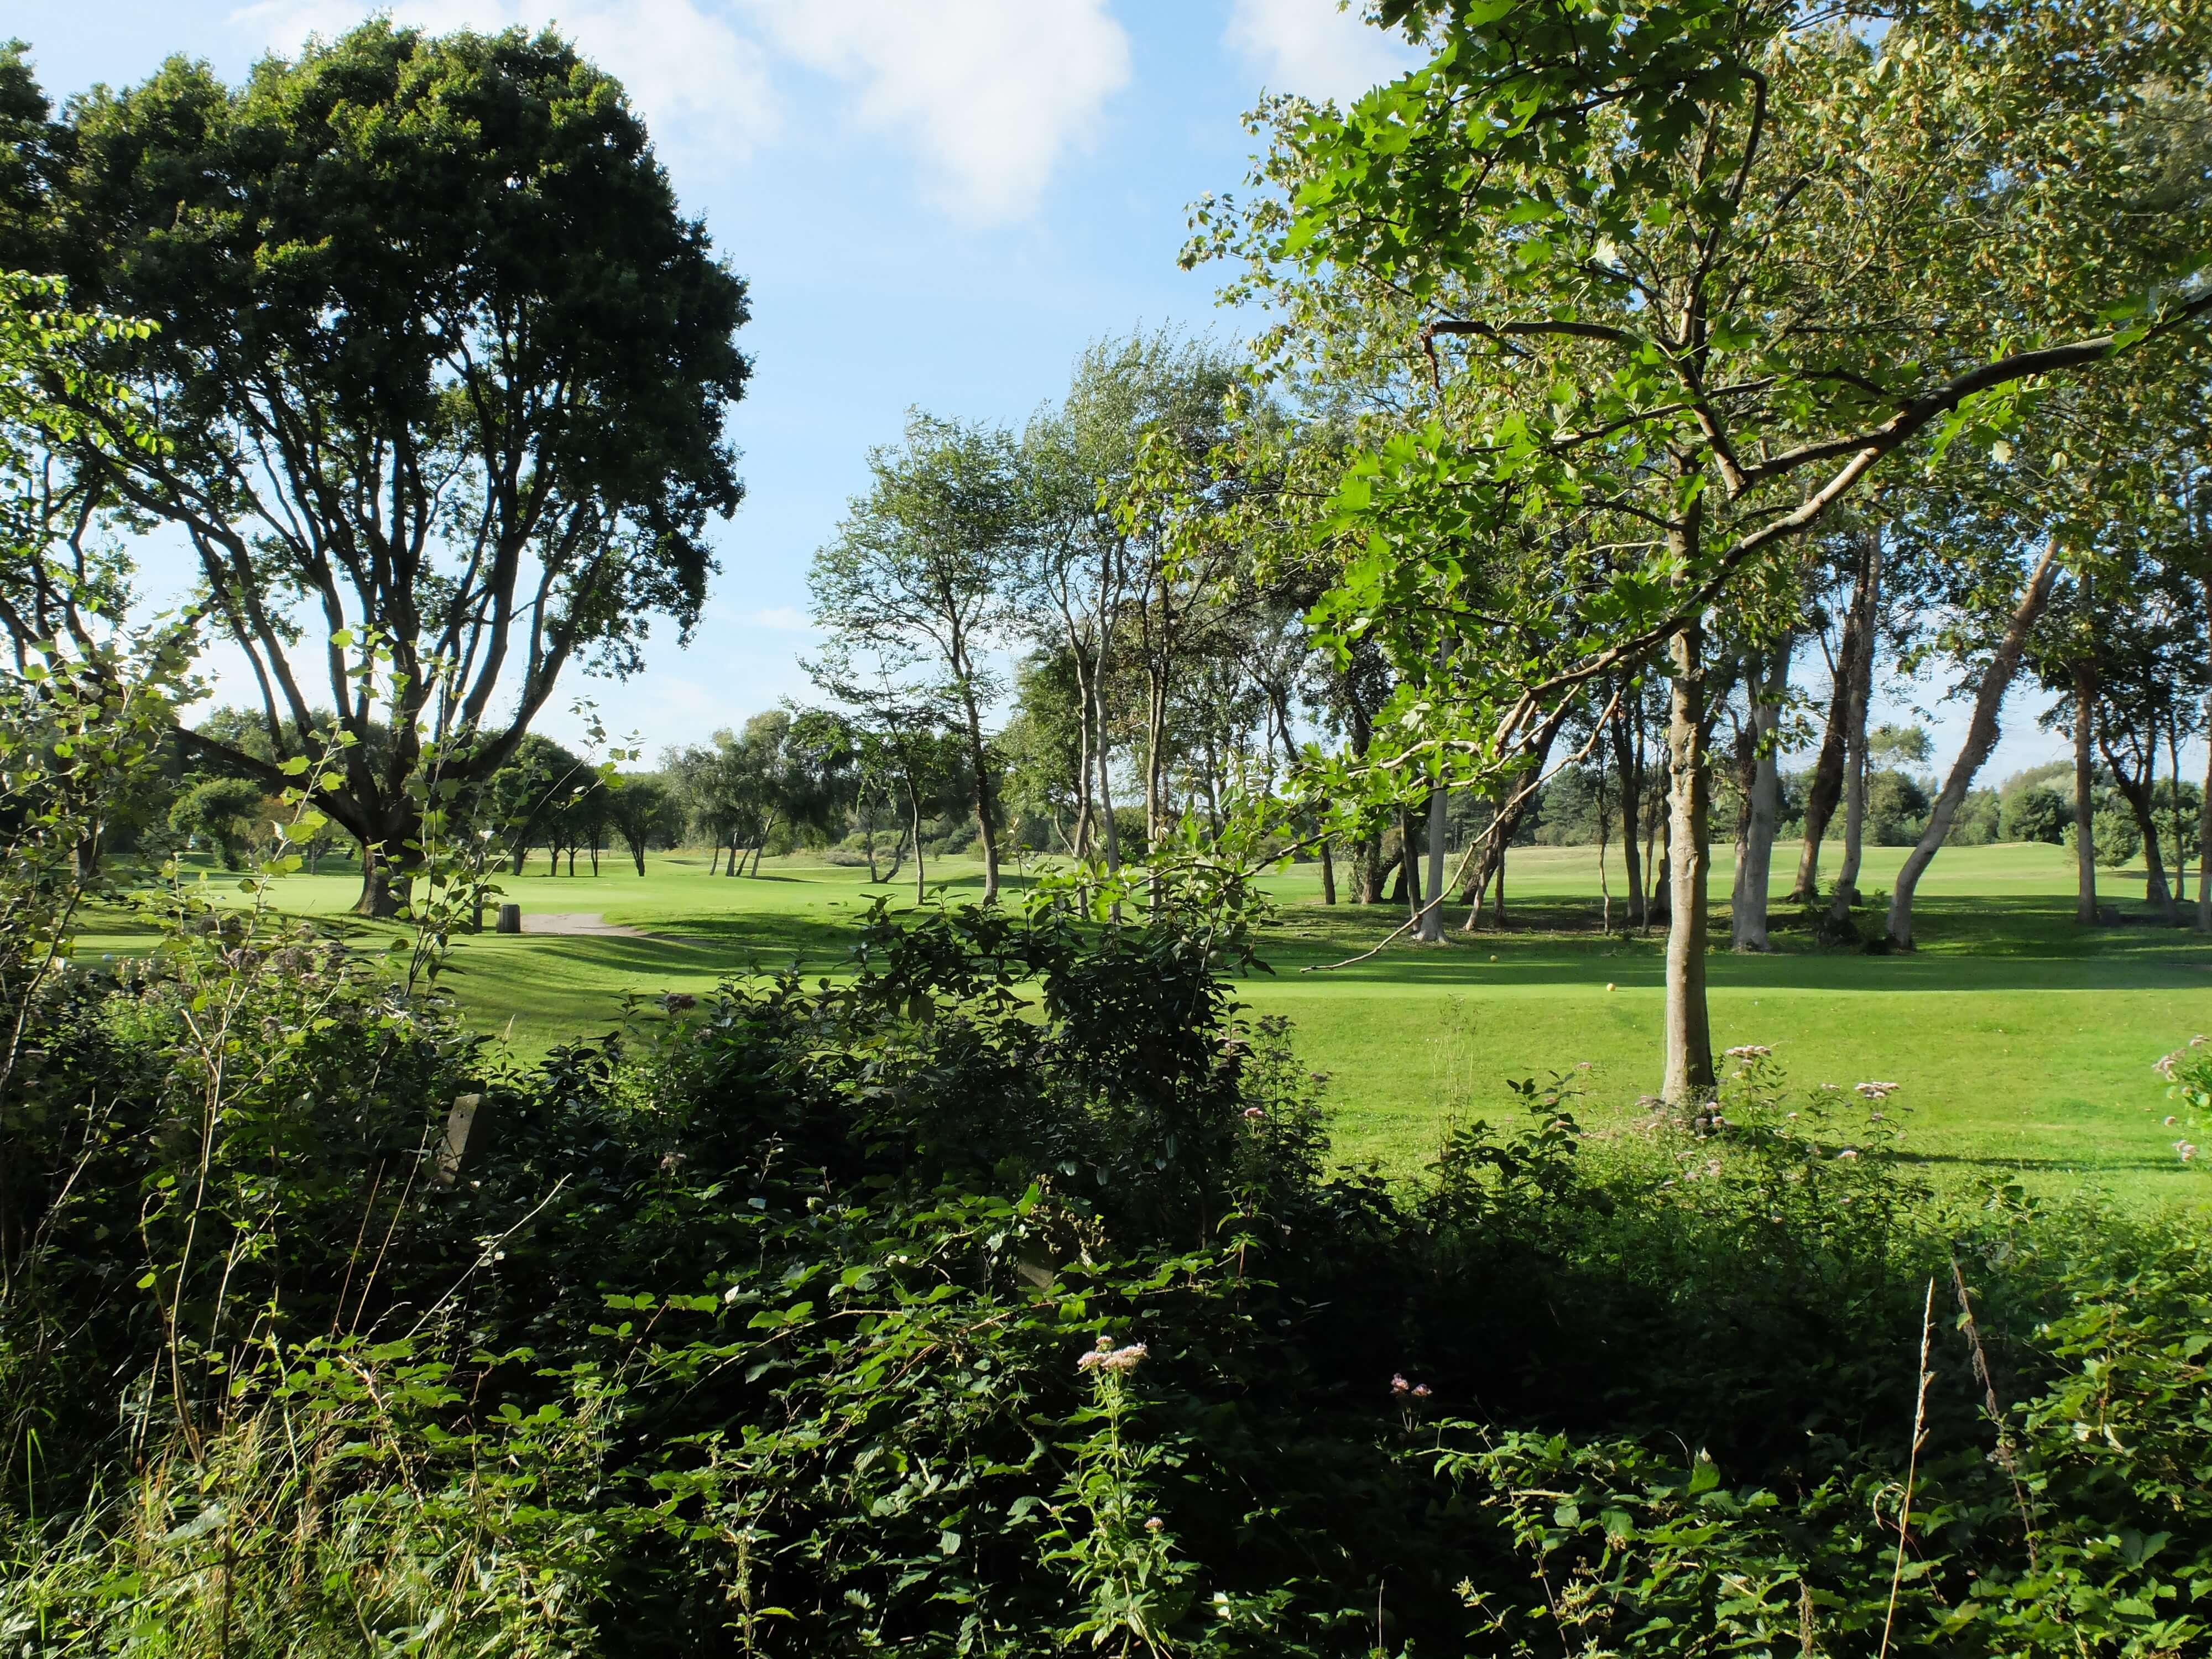 Why choose Le Touquet for a Golf Break?